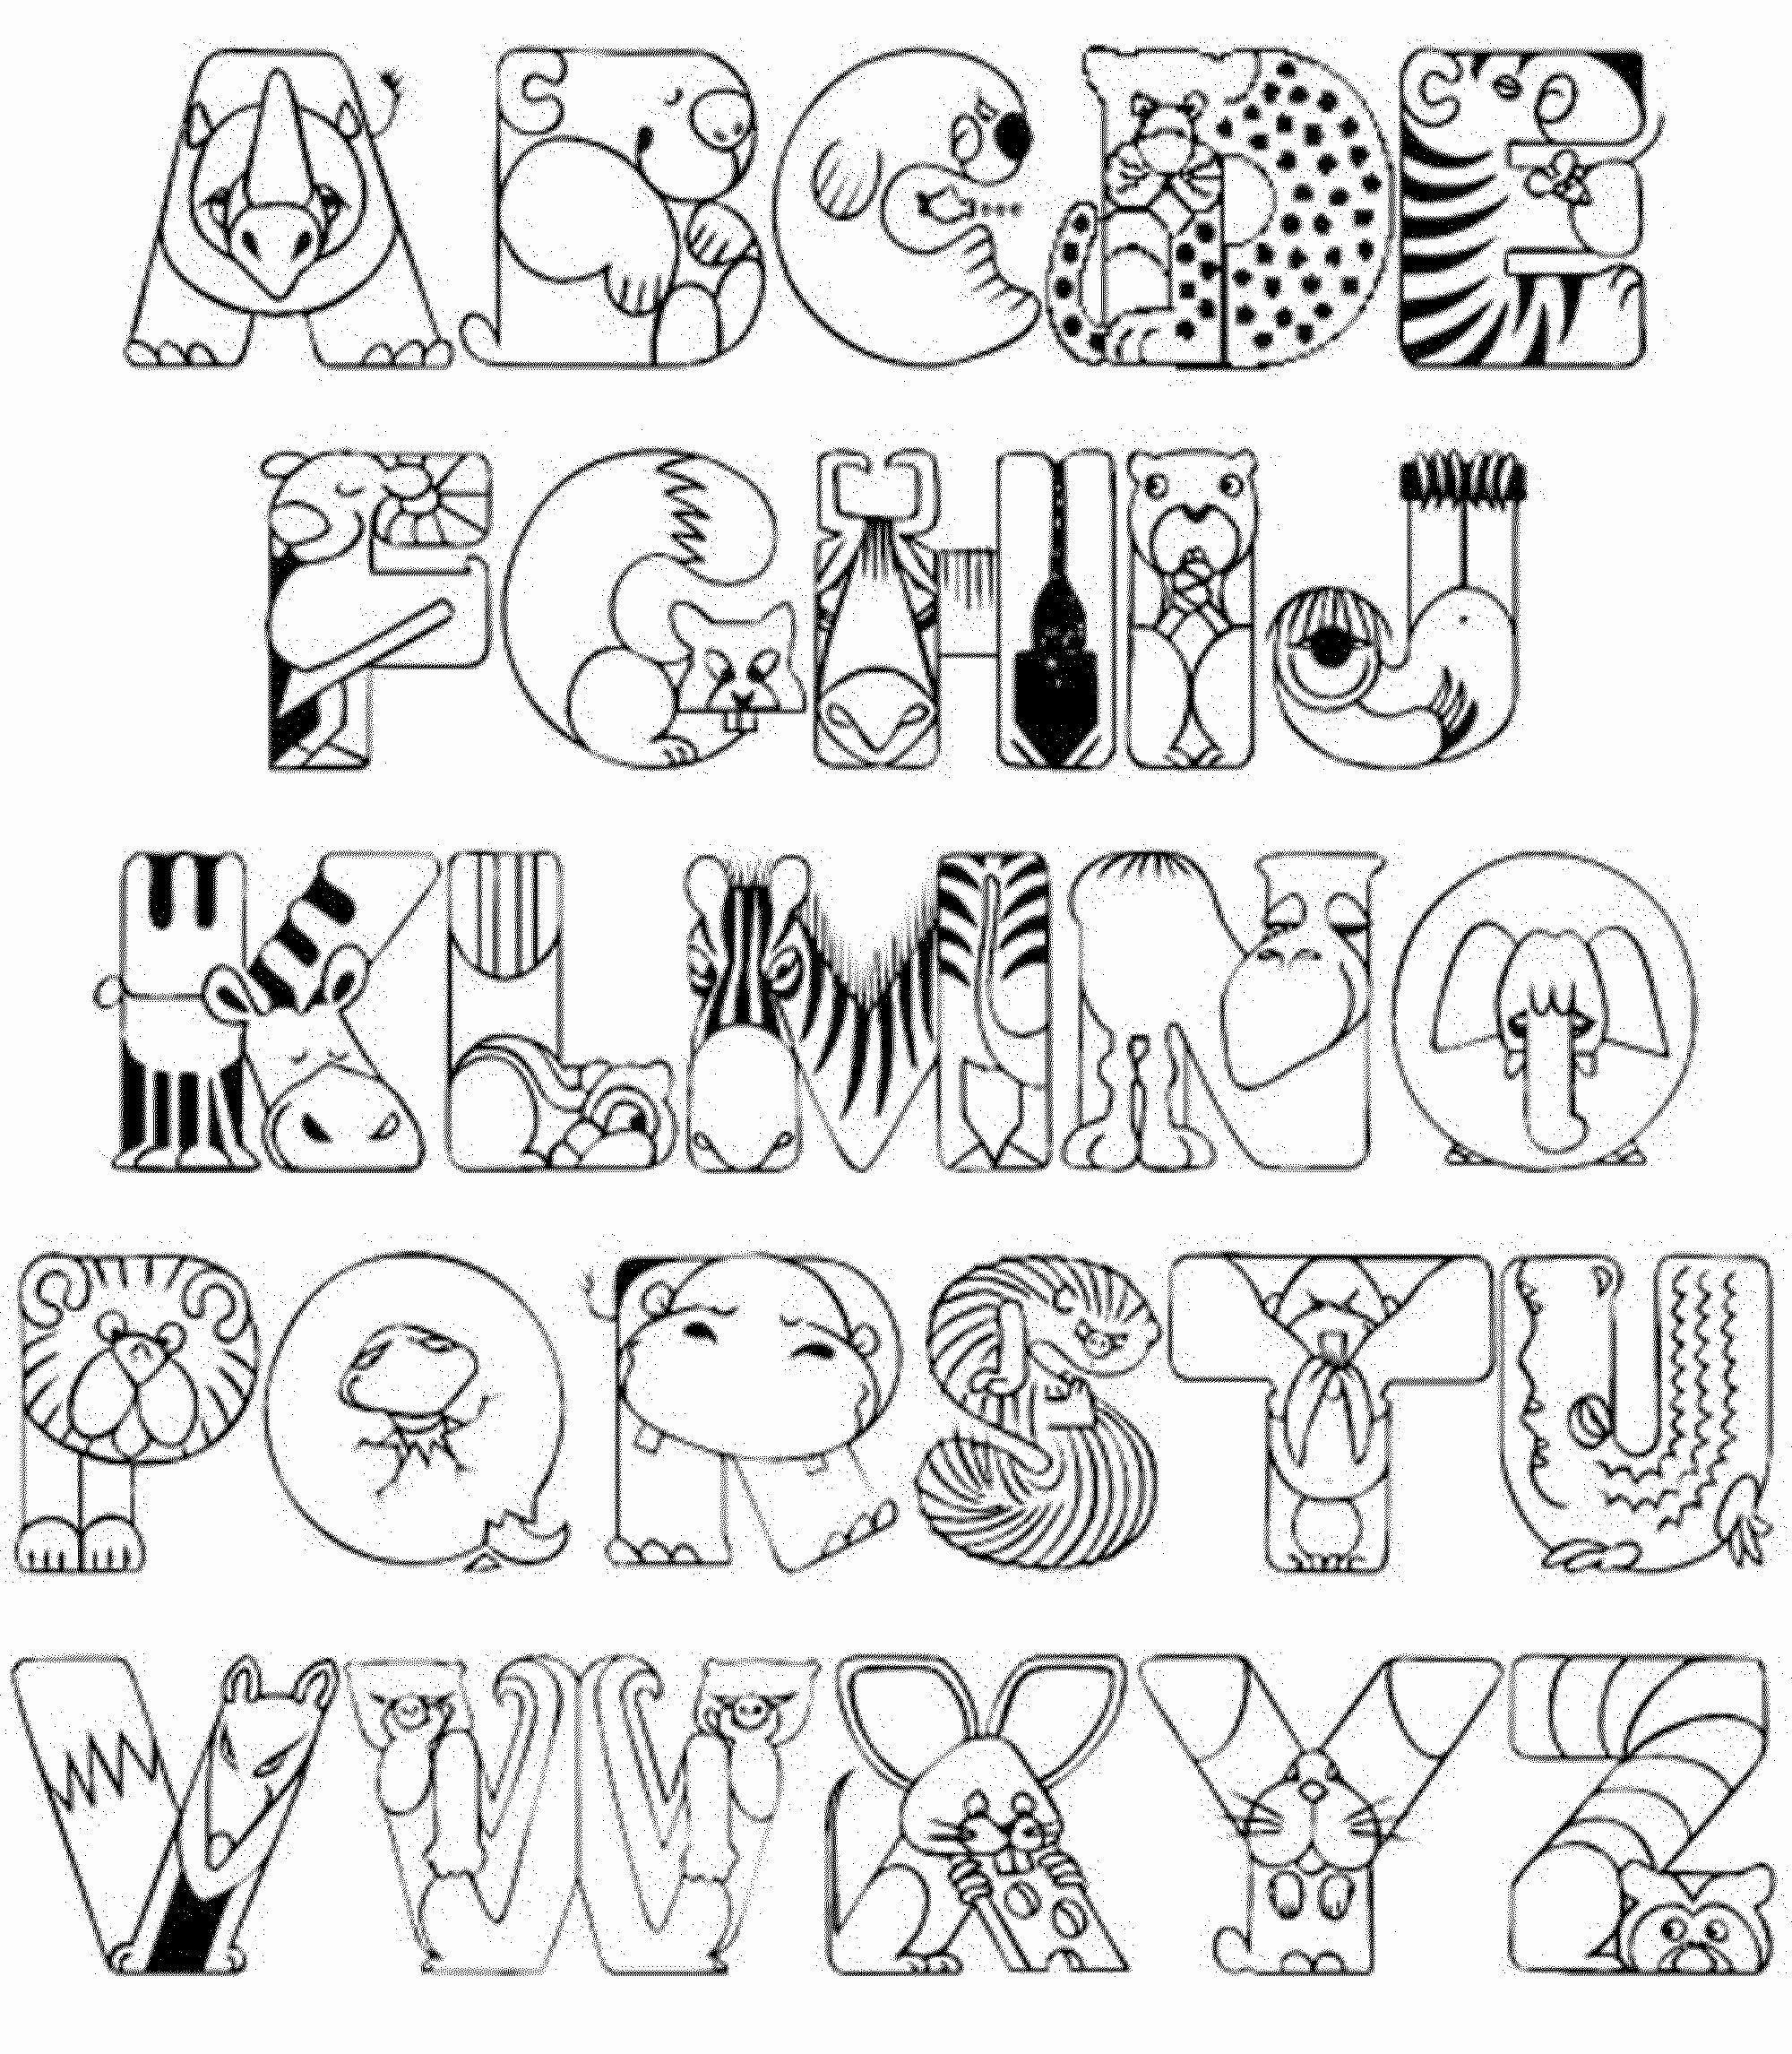 Alphabet Coloring Book Printable Alphabet Coloring Book Printable Pdf Free In 2020 Abc Coloring Pages Coloring Letters Letter A Coloring Pages